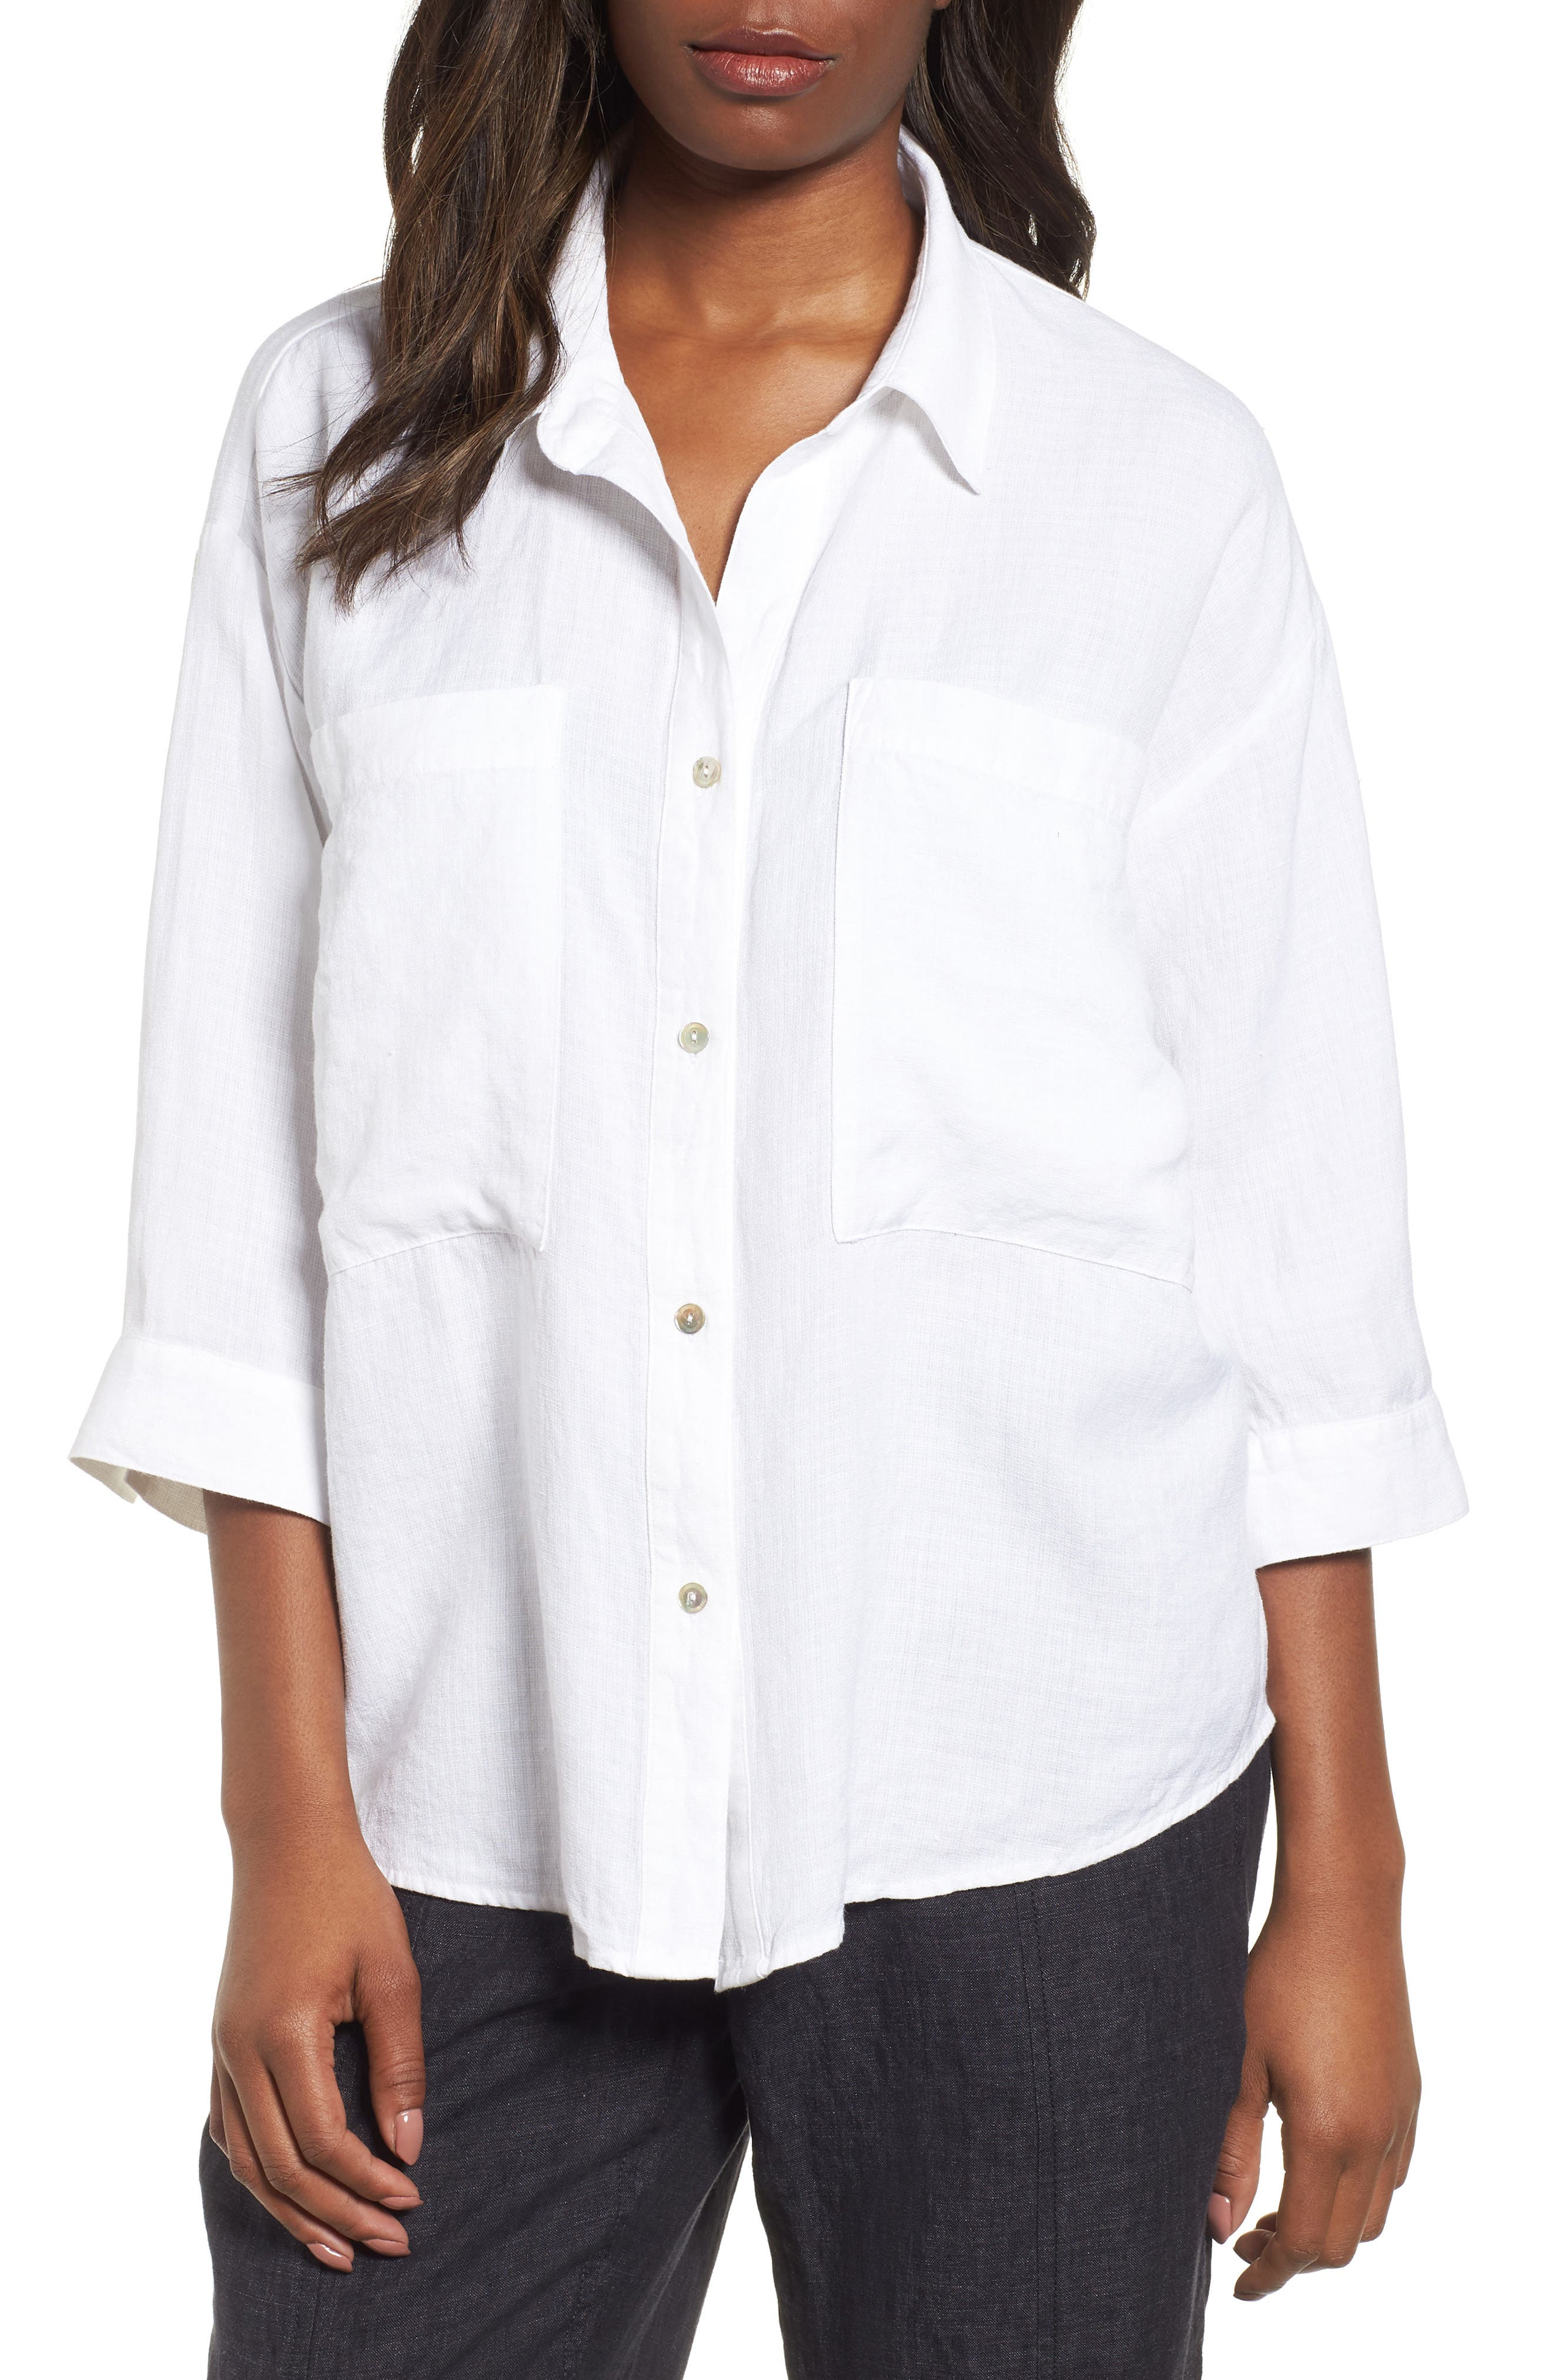 Woven Linen Blend Blouse,                             Main thumbnail 1, color,                             White